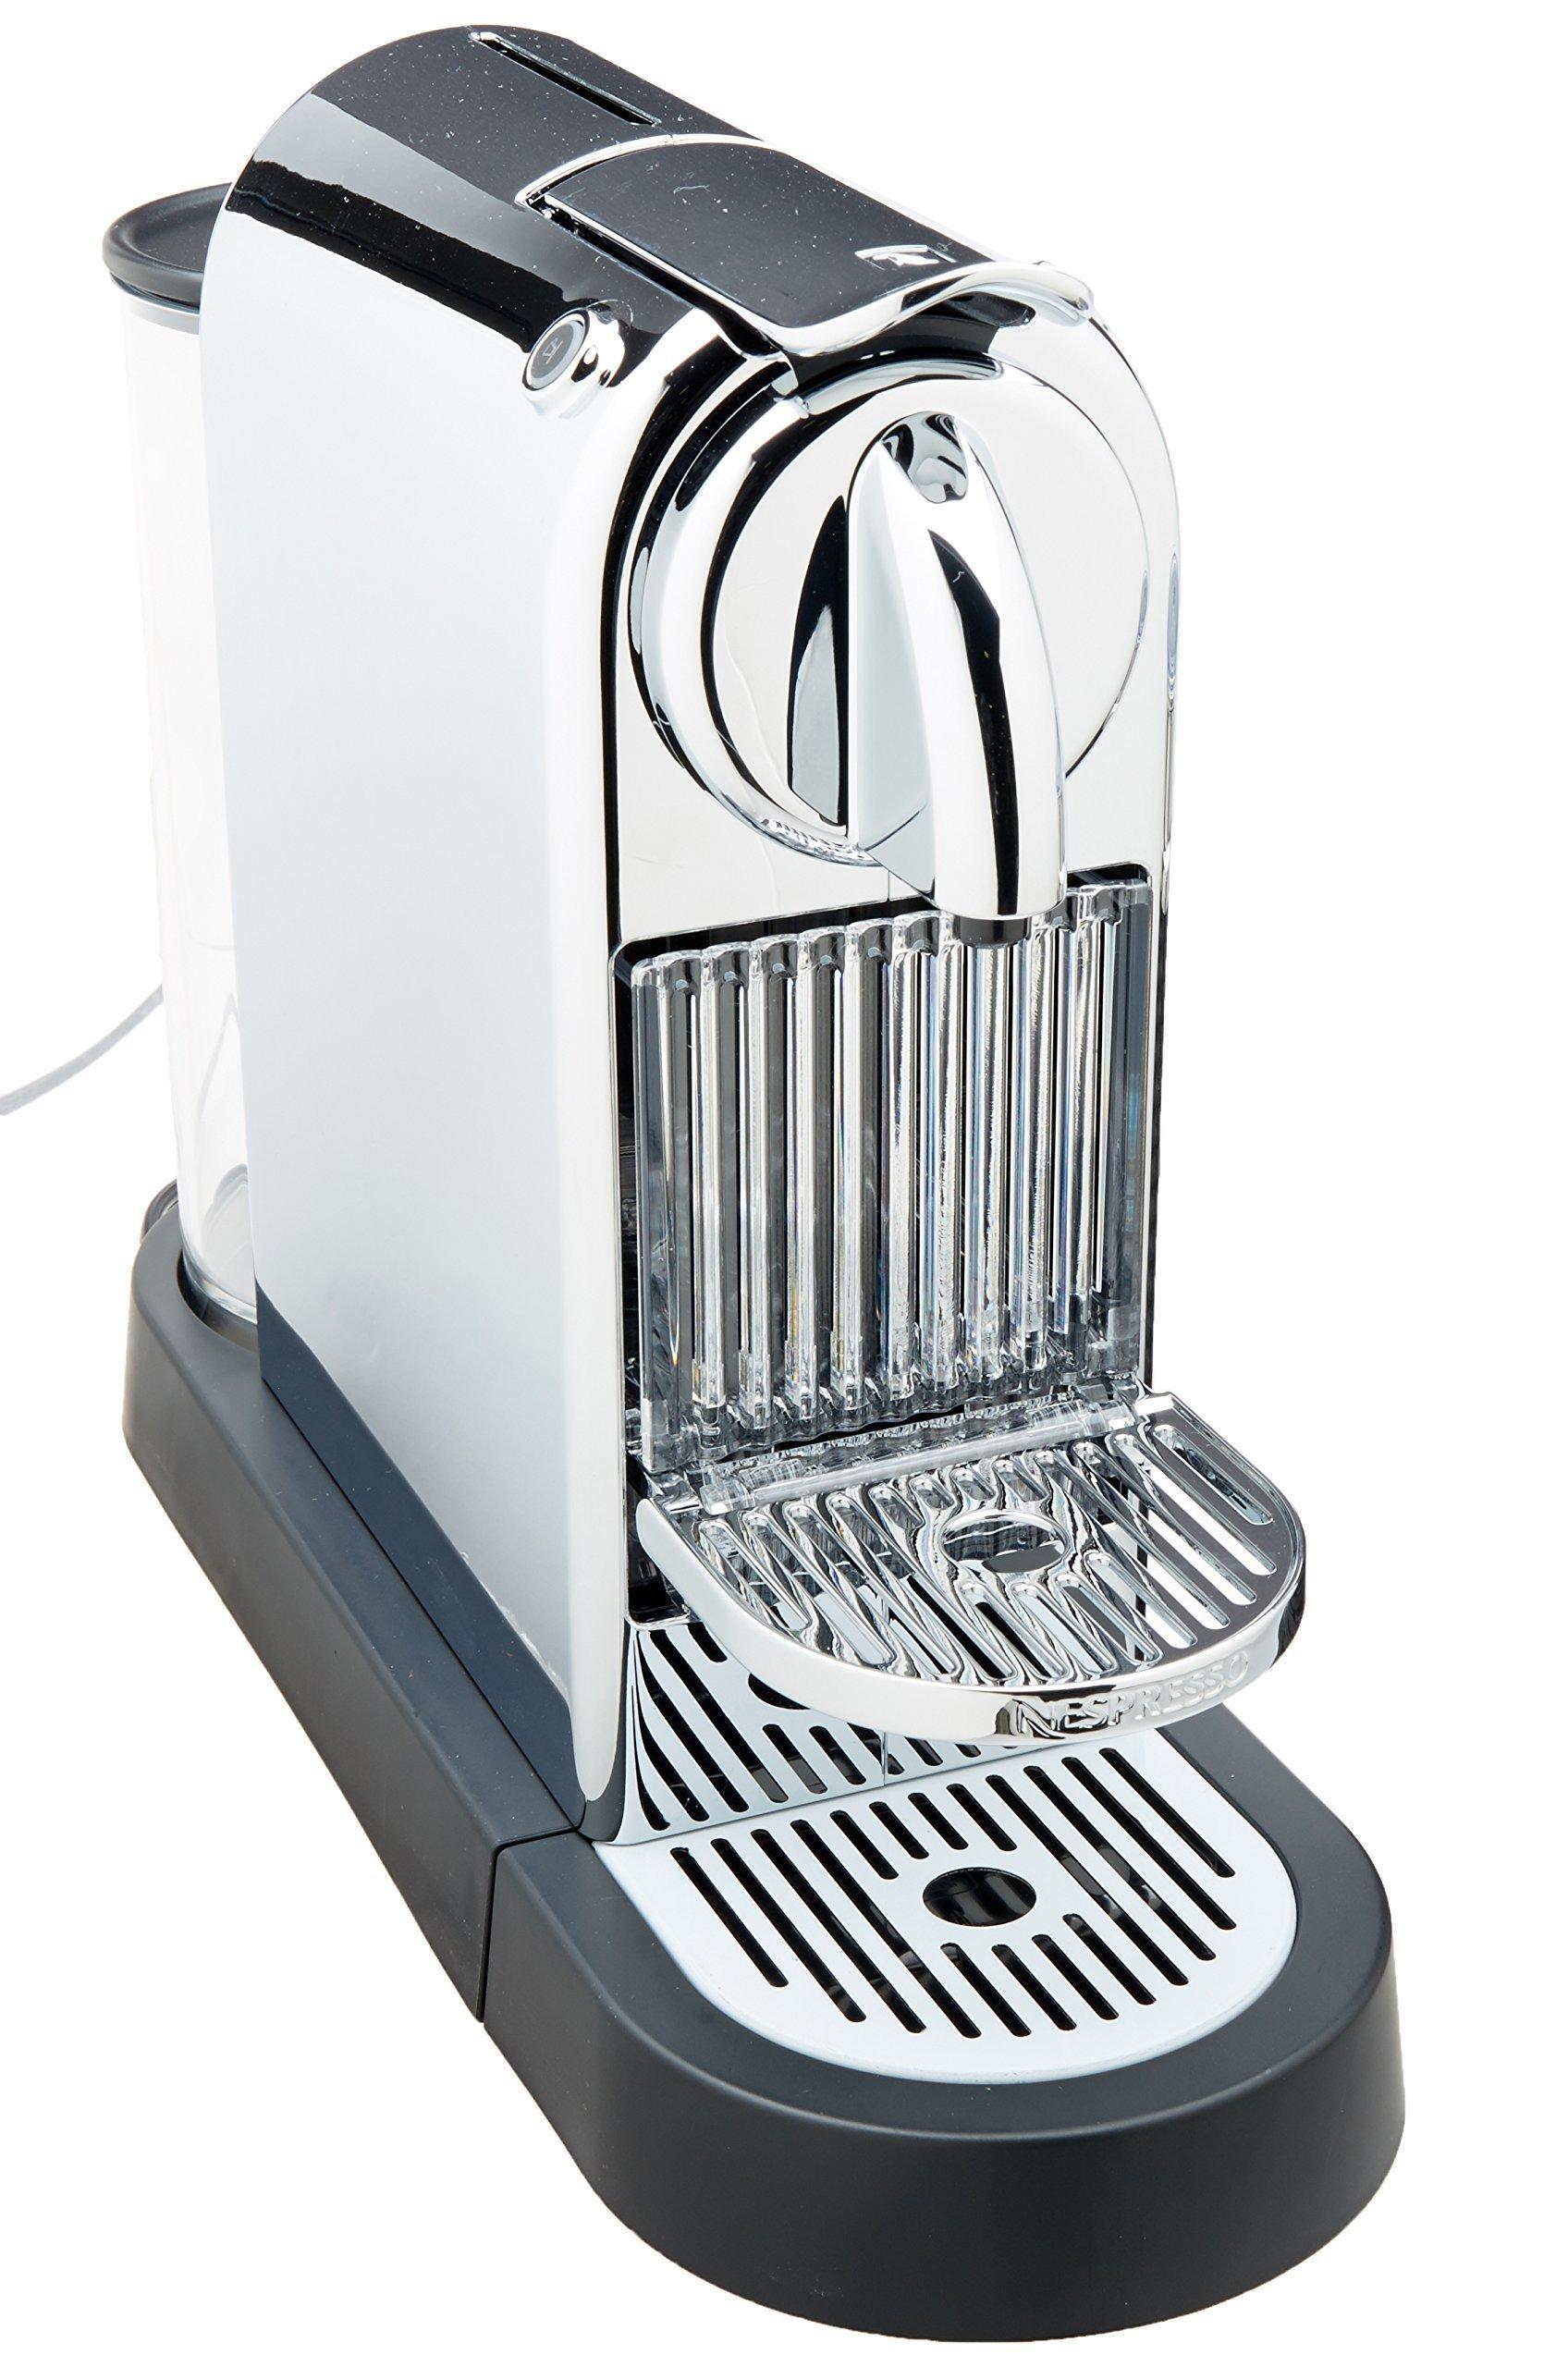 Nespresso Citiz D111 Chrome Single Serve Espresso Machine